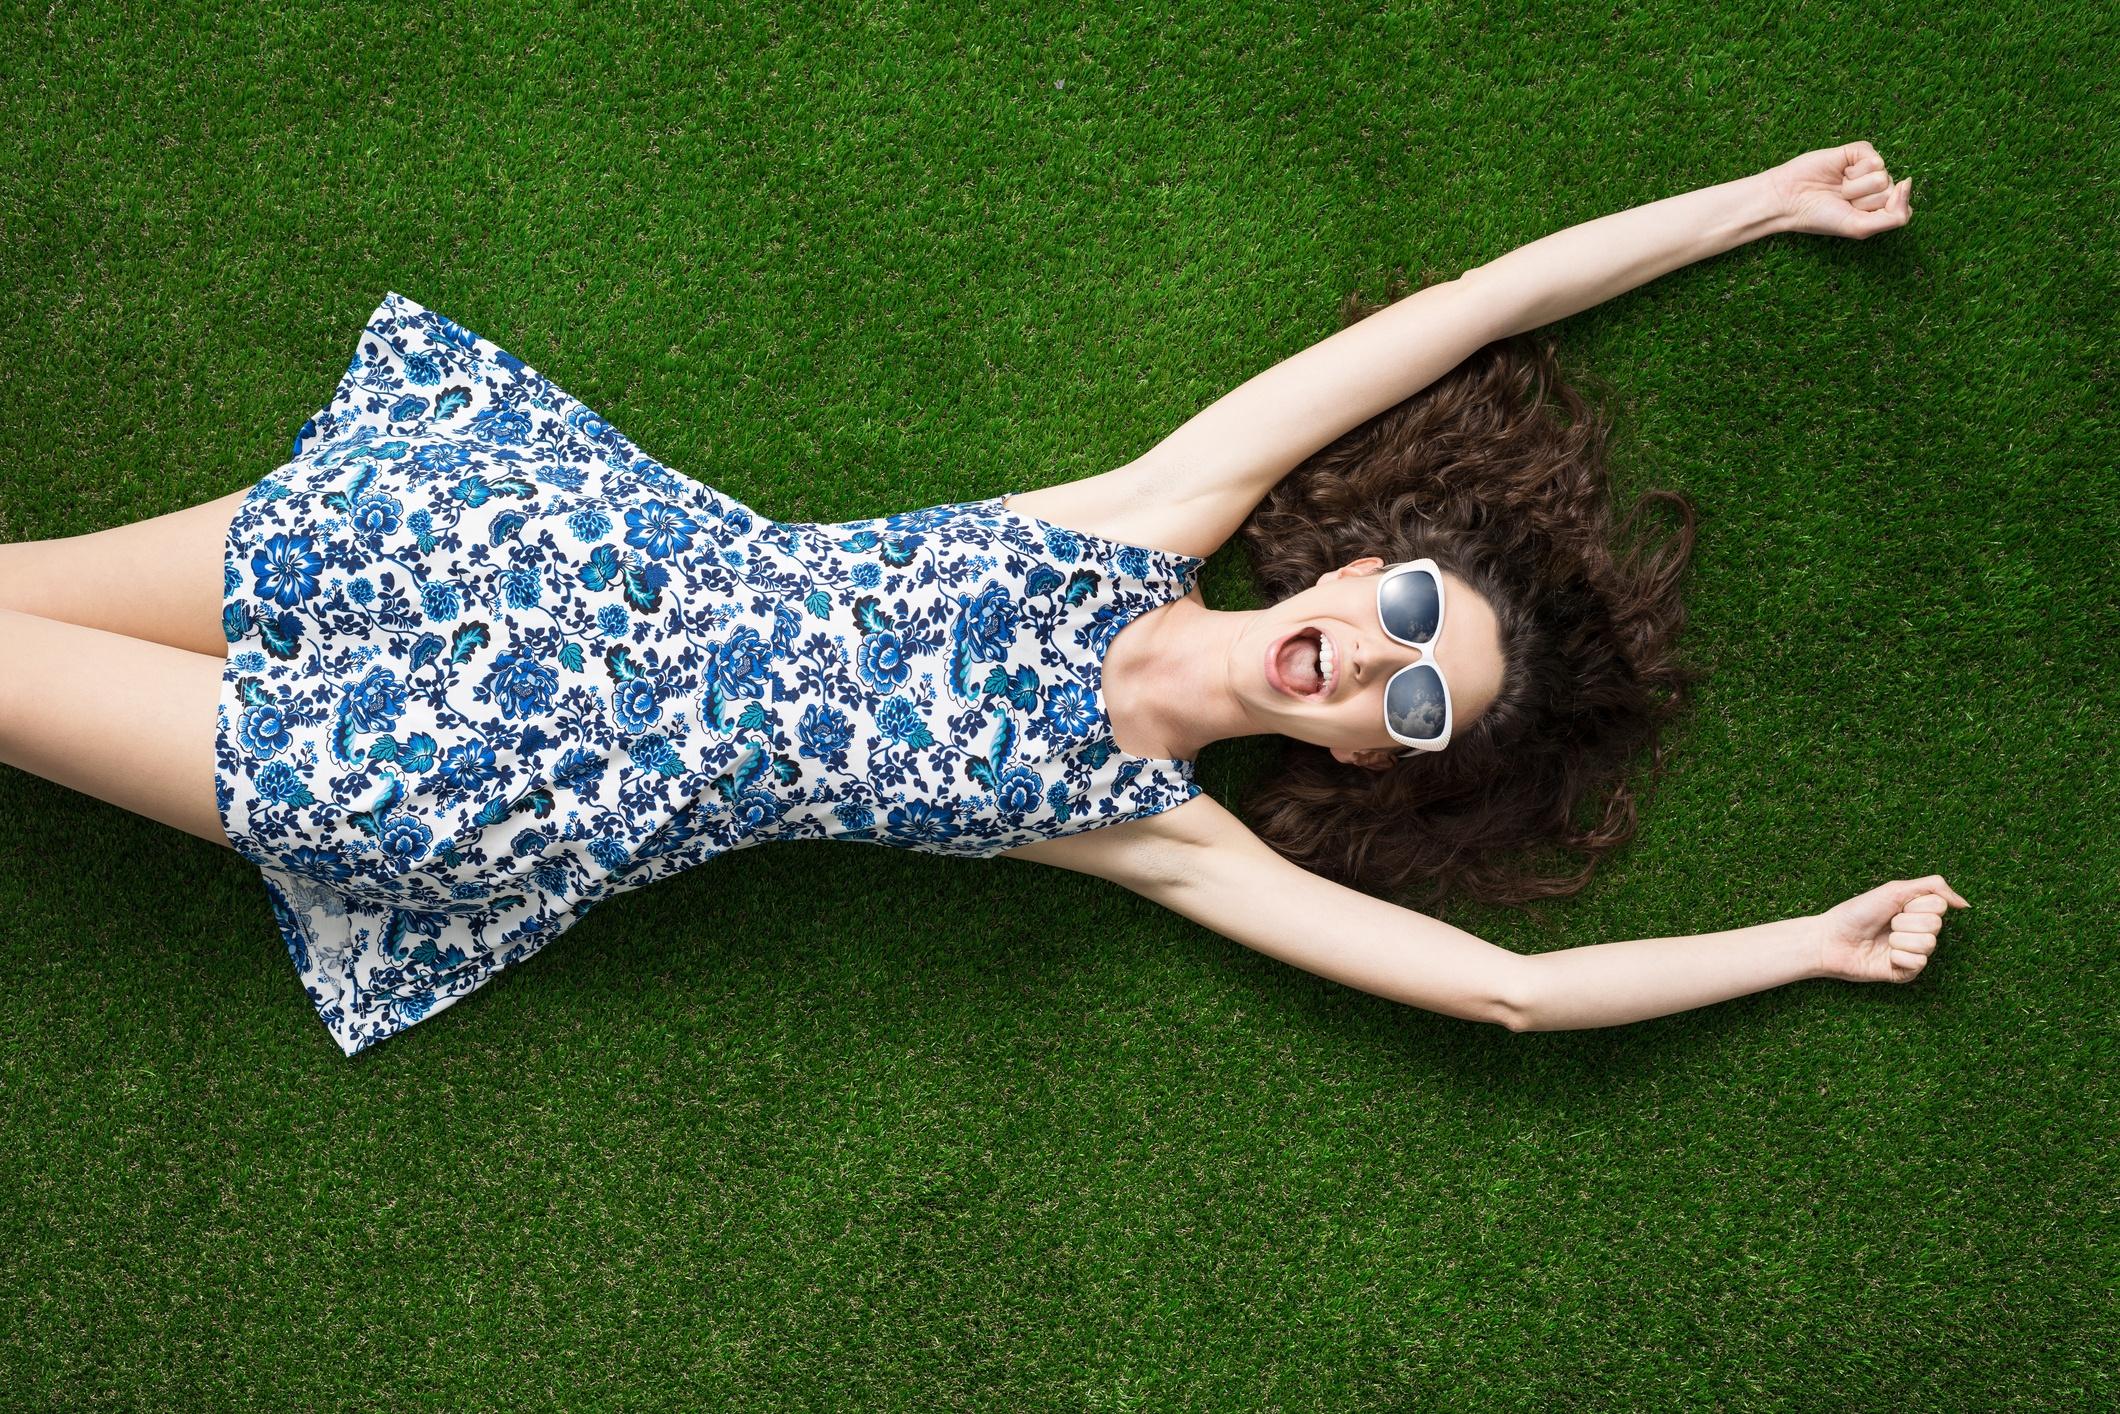 laying-on-lawn-summer.jpg